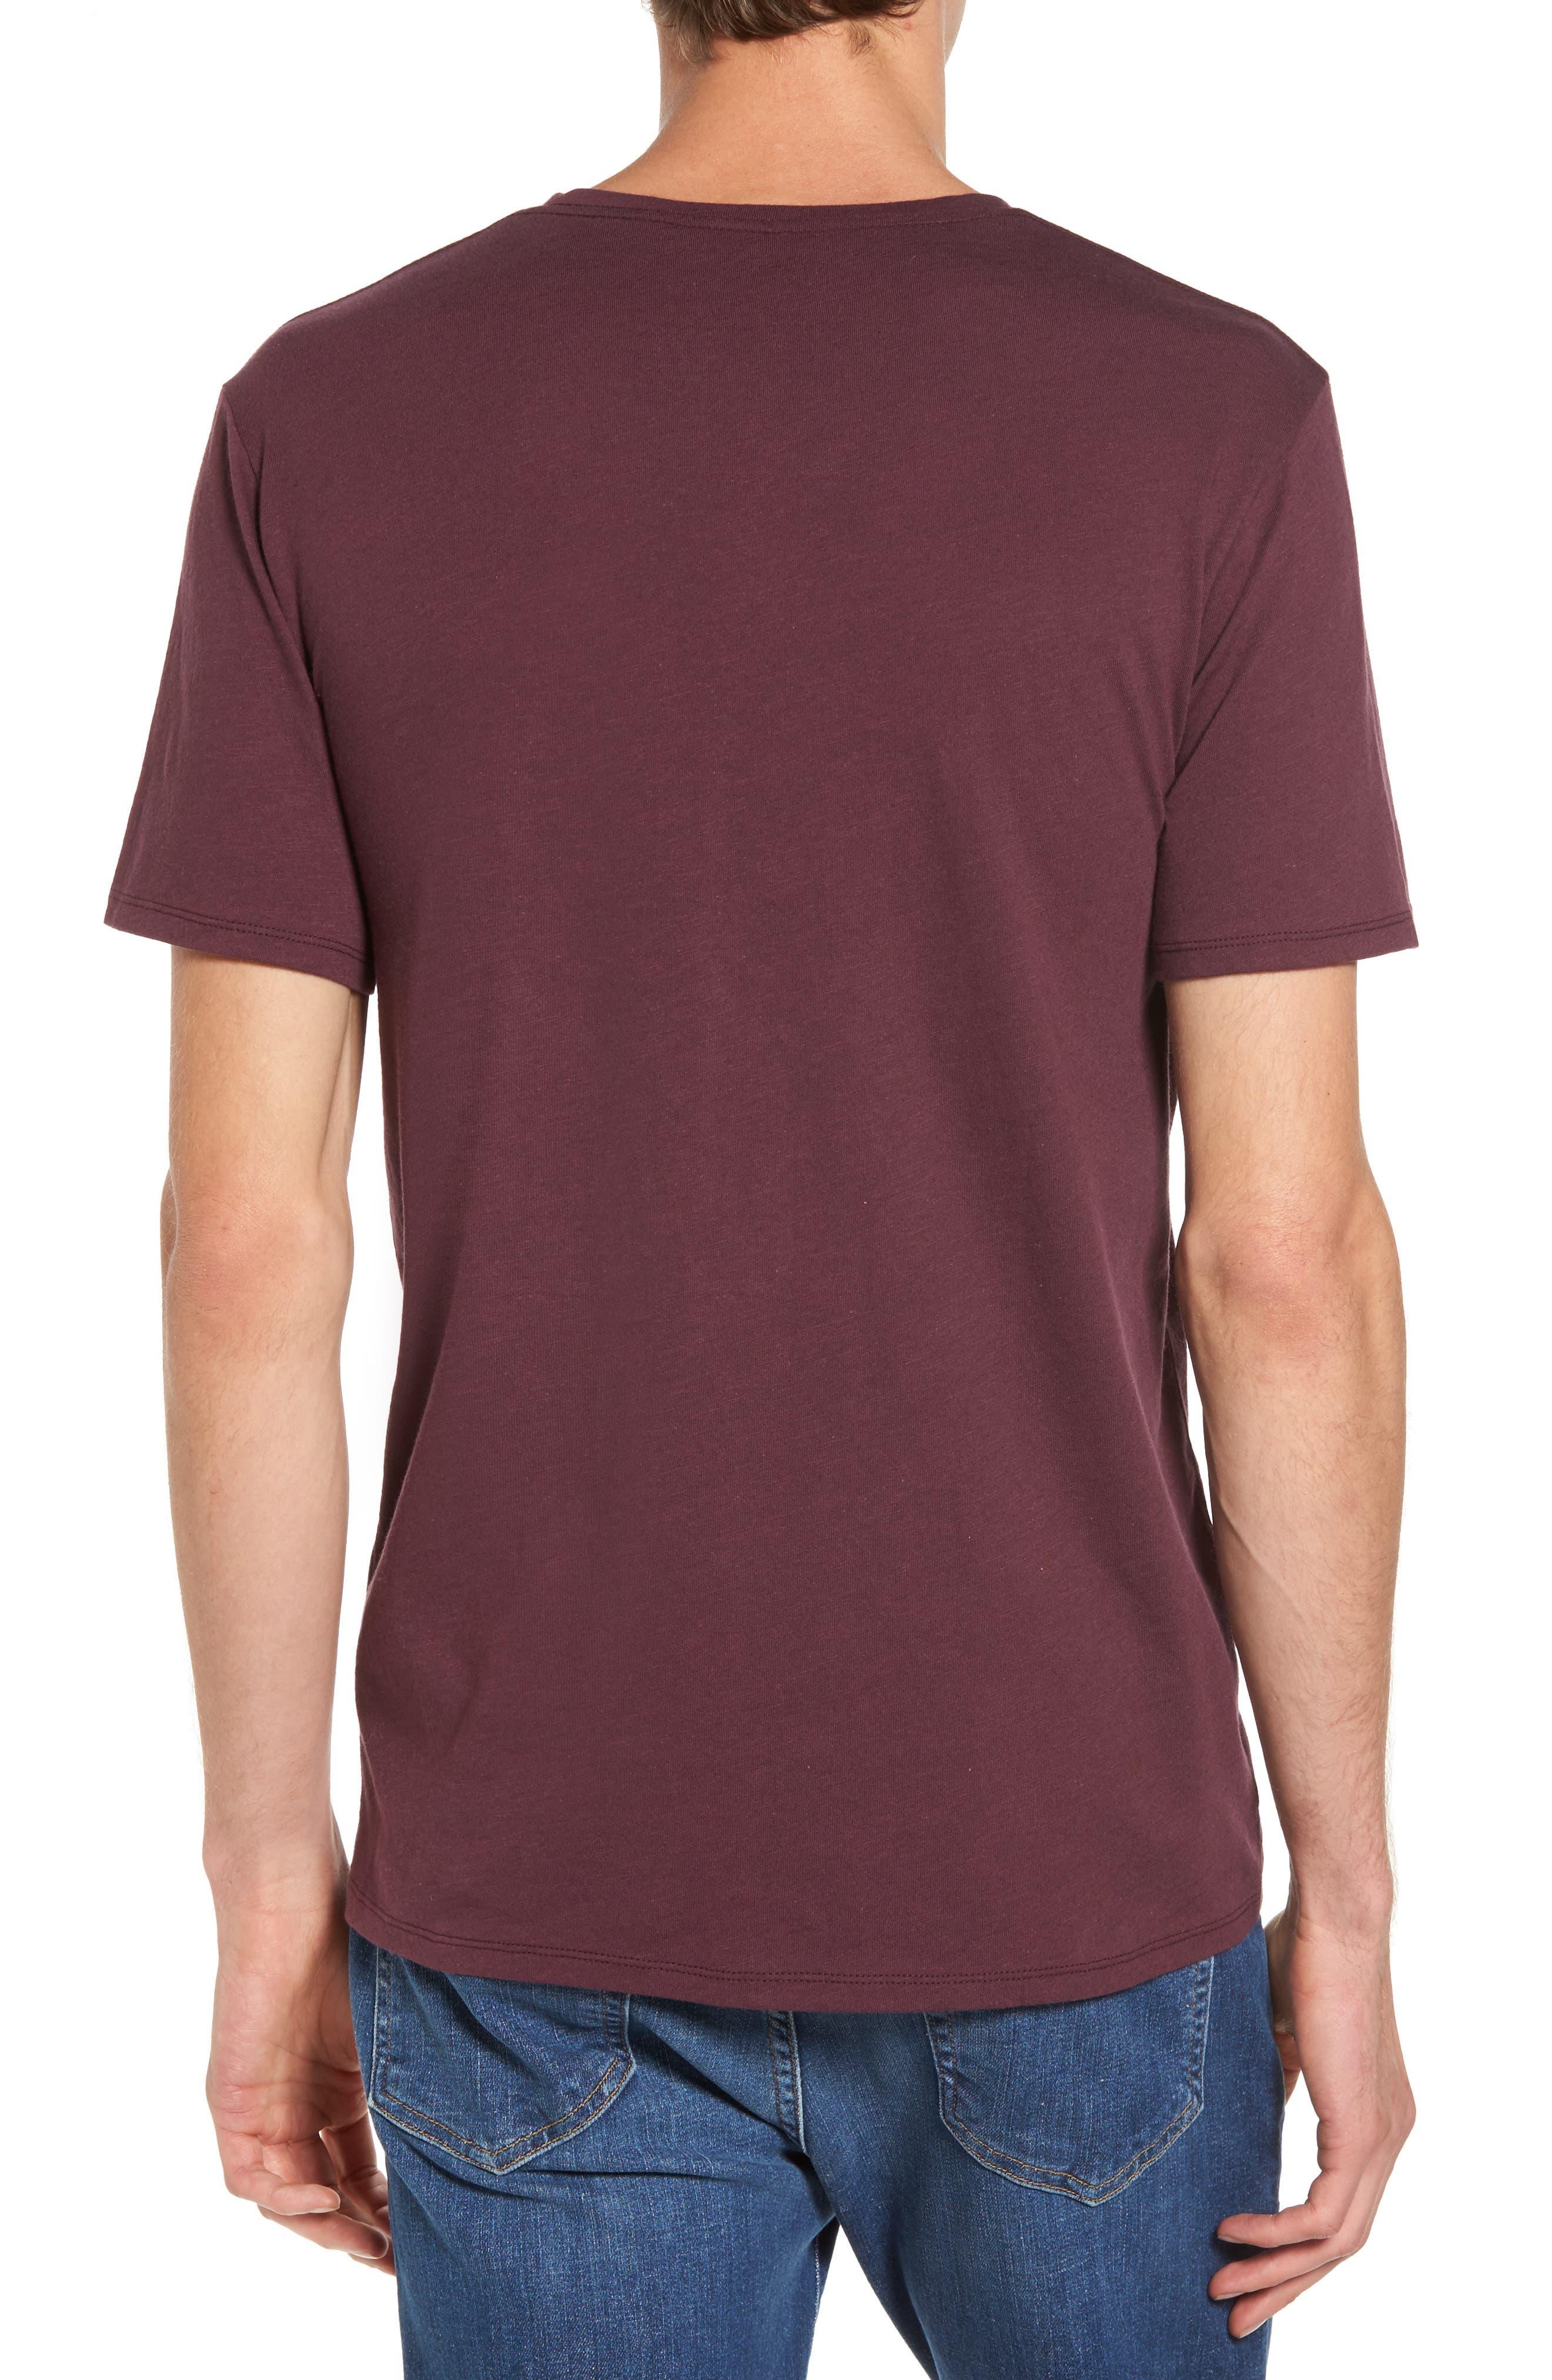 Alternate Image 2  - The Rail Slub Cotton V-Neck T-Shirt (2 for $30)